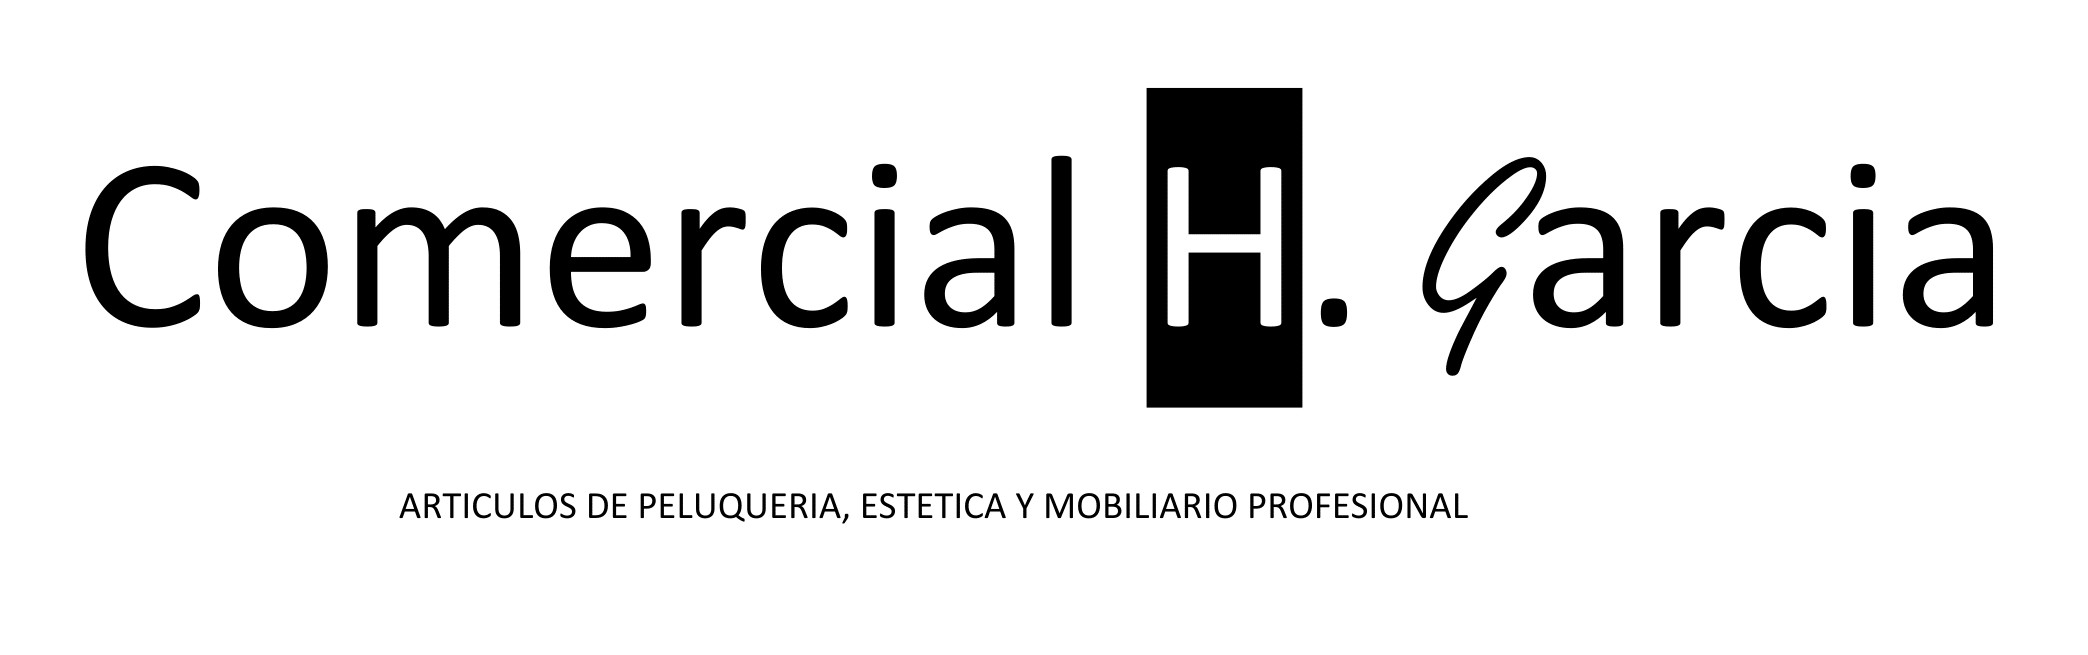 COMERCIAL H. GARCIA